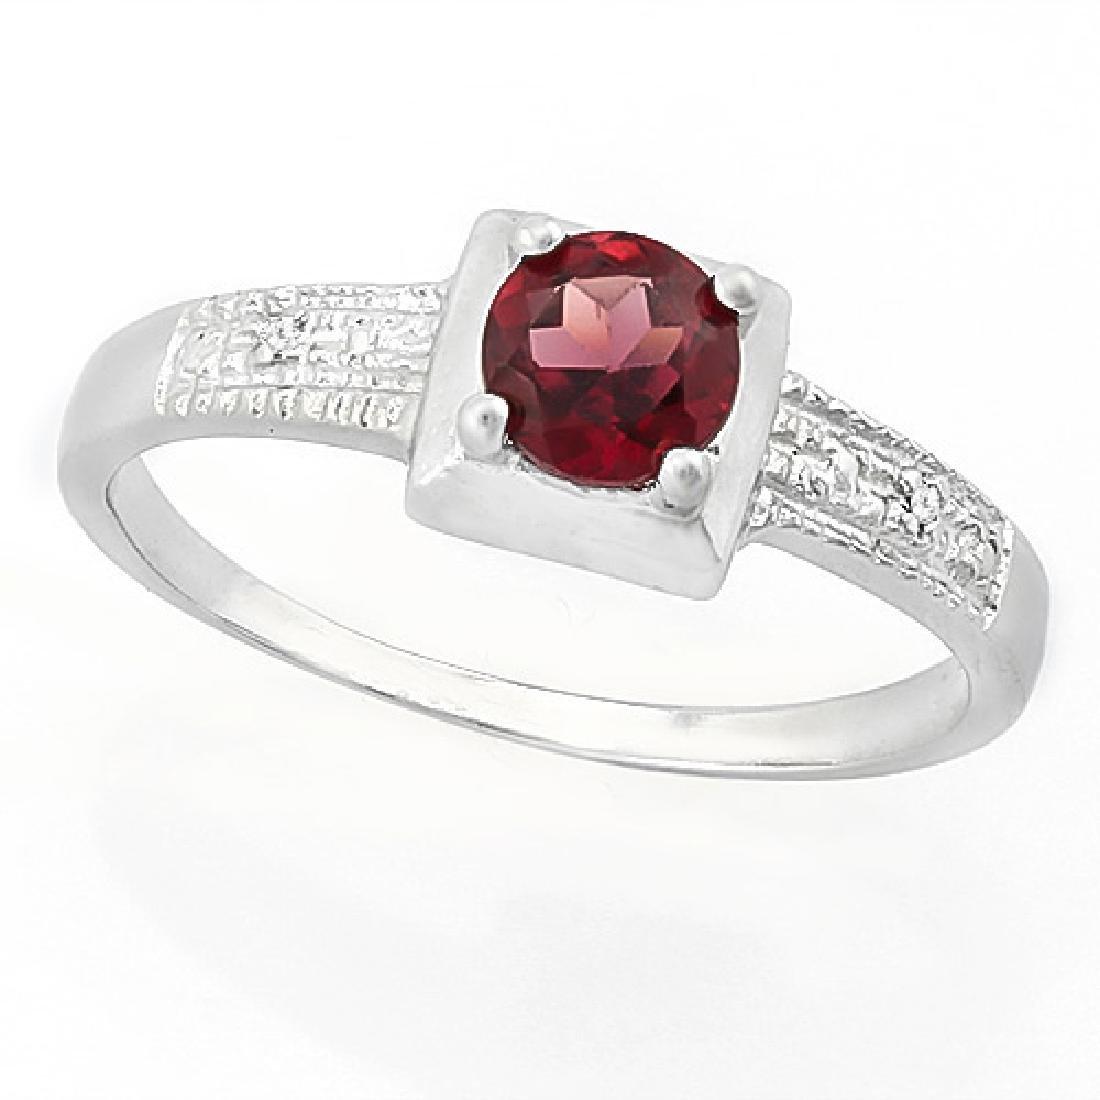 3/5 CARAT GARNET & DIAMOND 925 STERLING SILVER RING